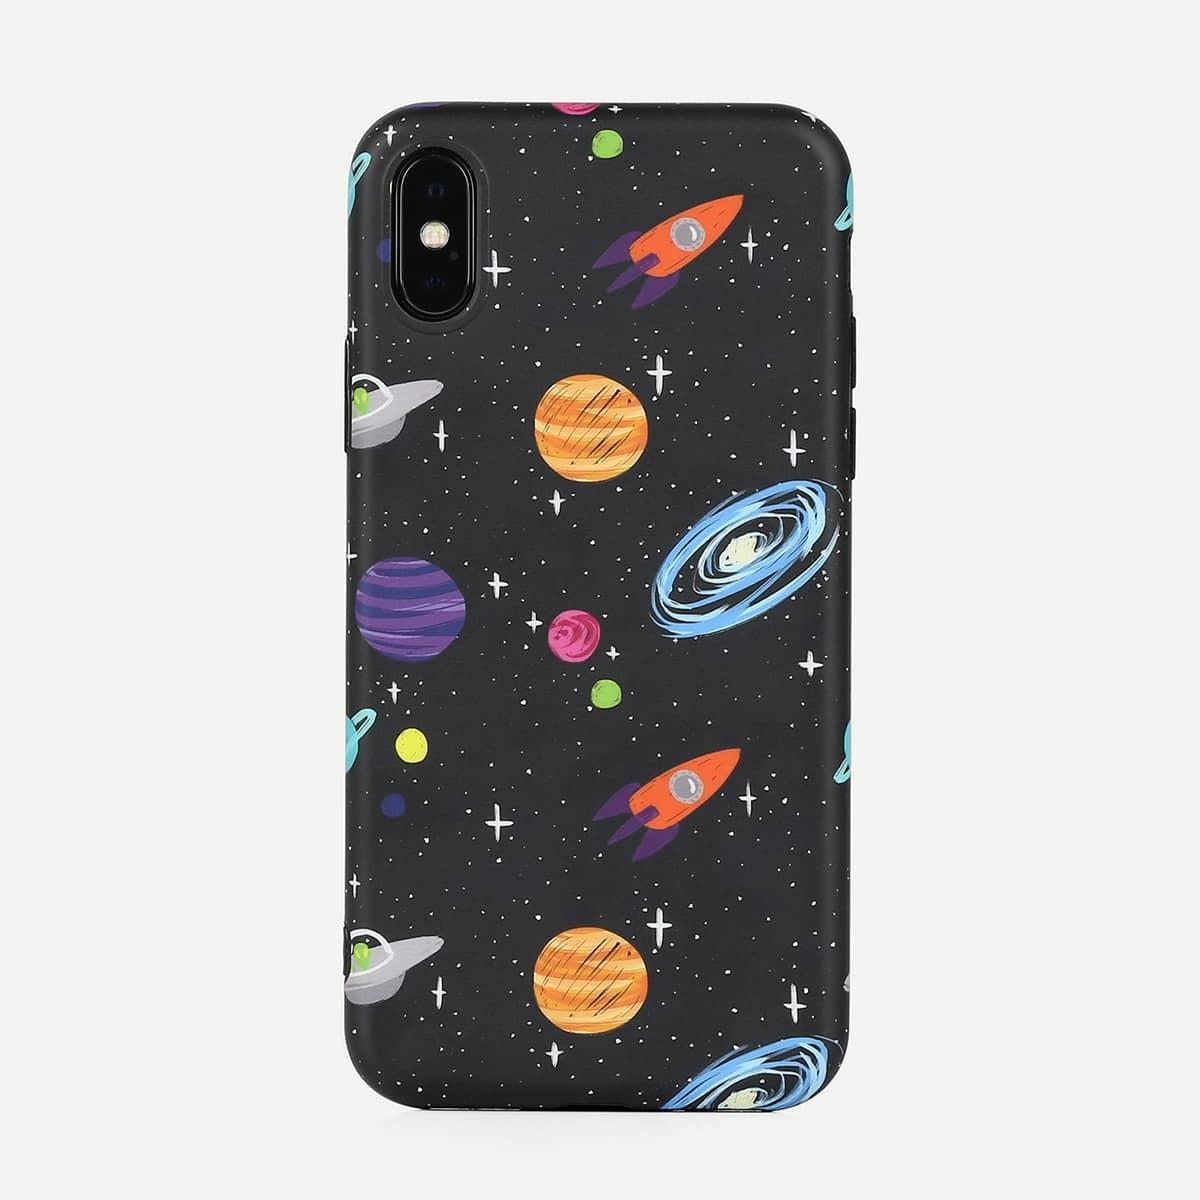 Galaxy-Muster iPhone Fall